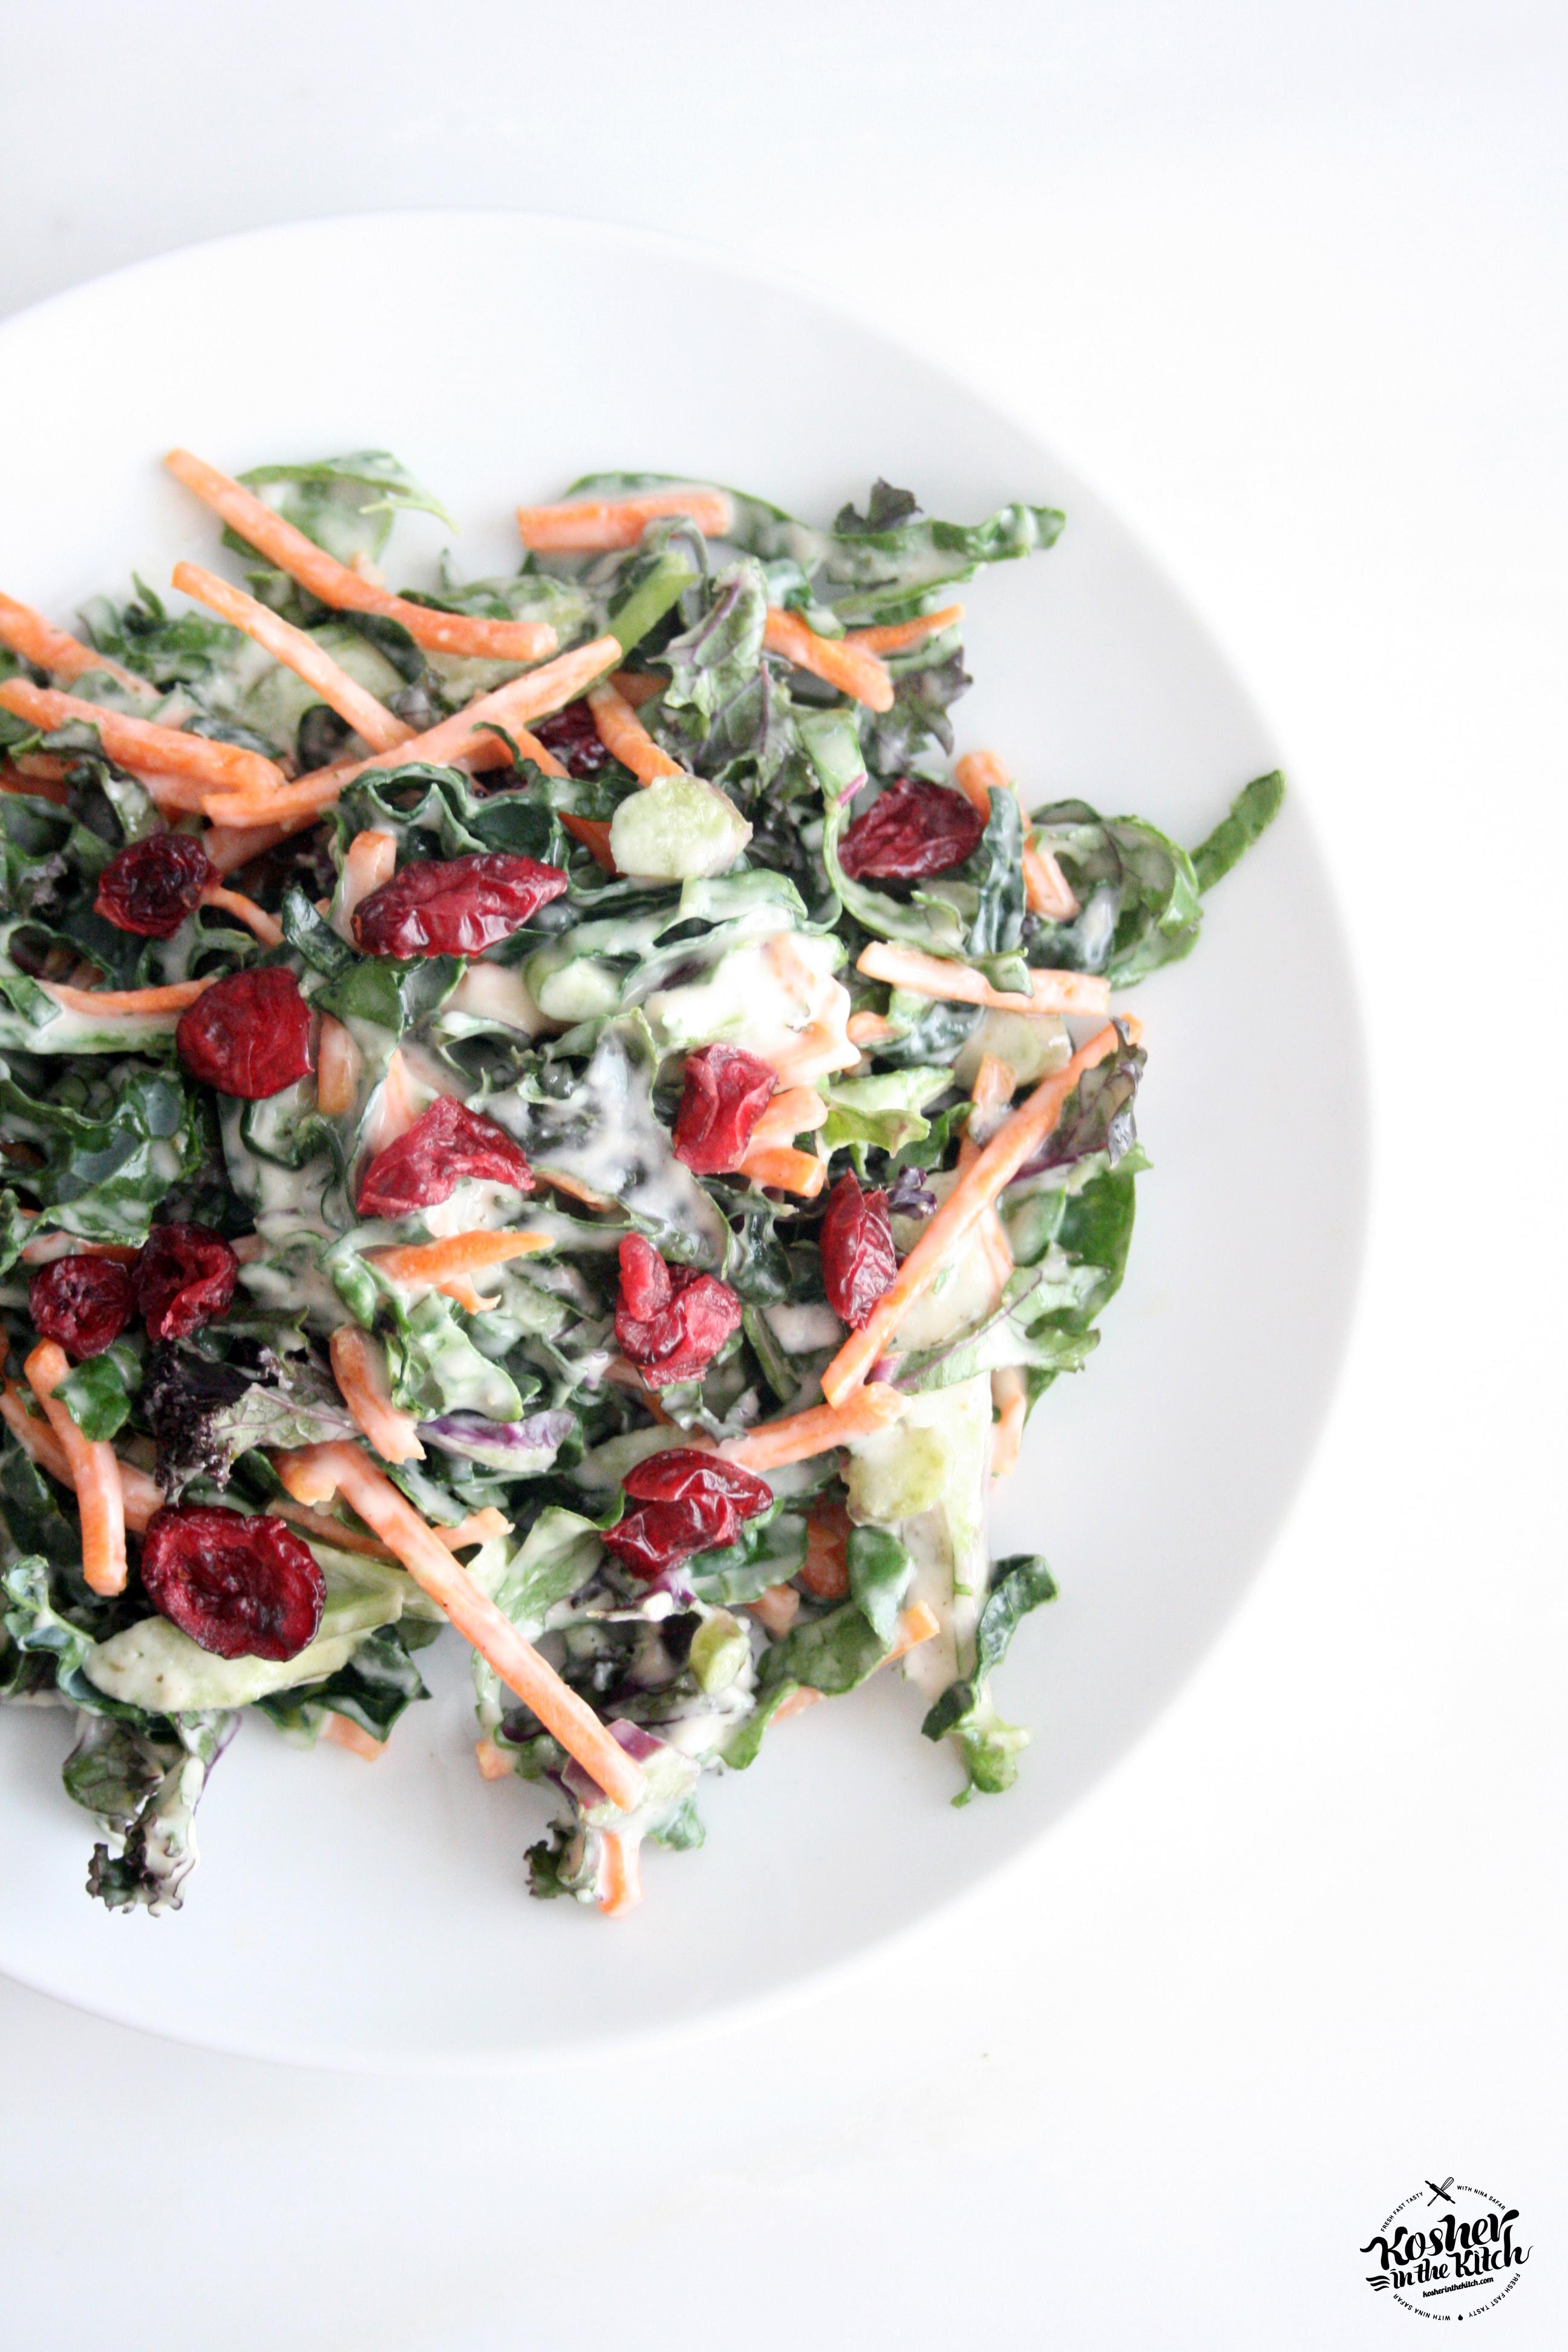 Shredded Kale Salad with Tahini Dressing